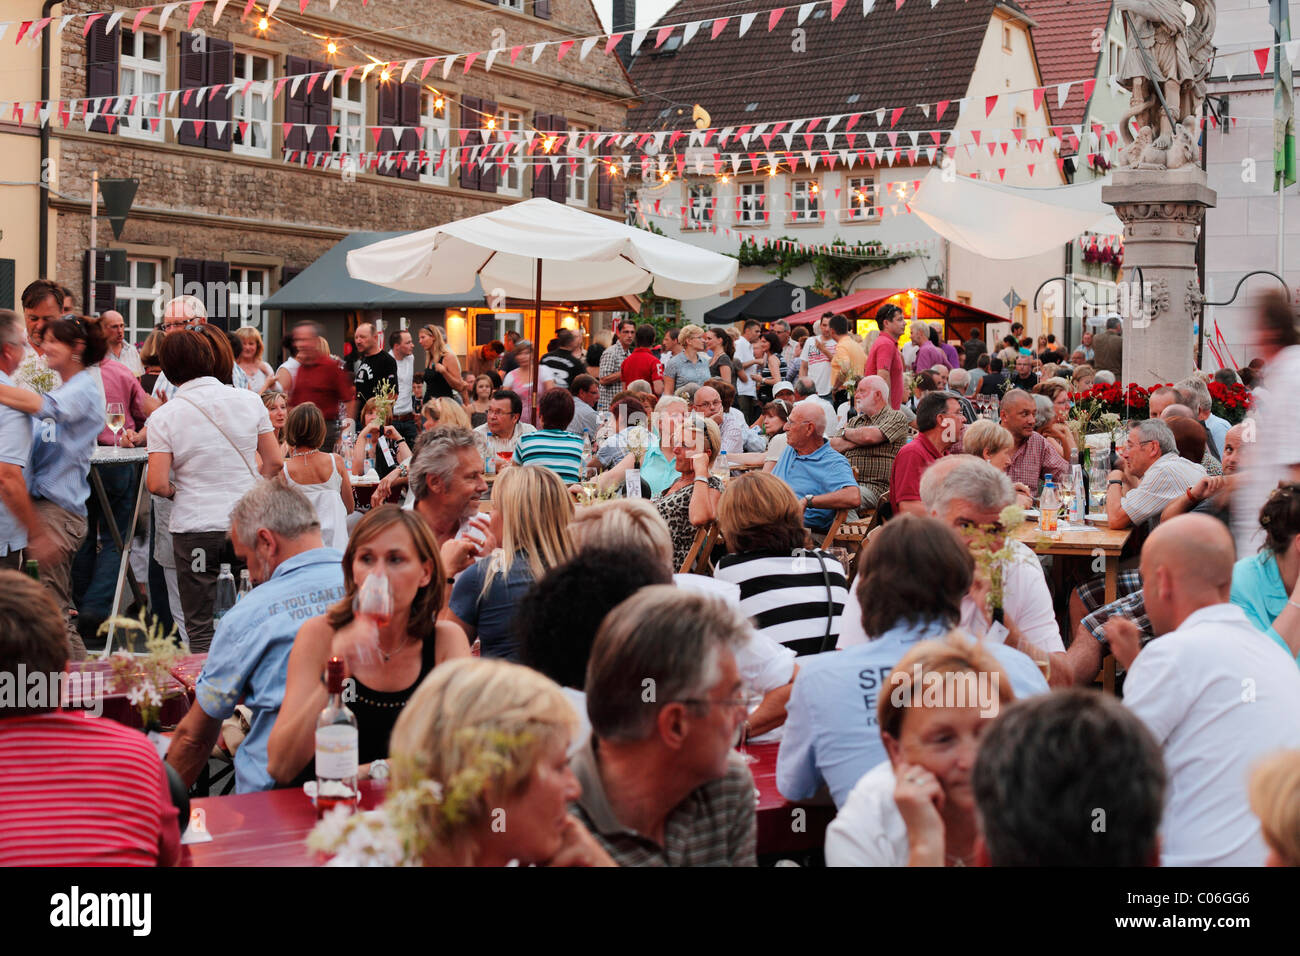 Wine festival, Sommerach, Main-Franconia region, Lower Franconia, Franconia, Bavaria, Germany, Europe Stock Photo